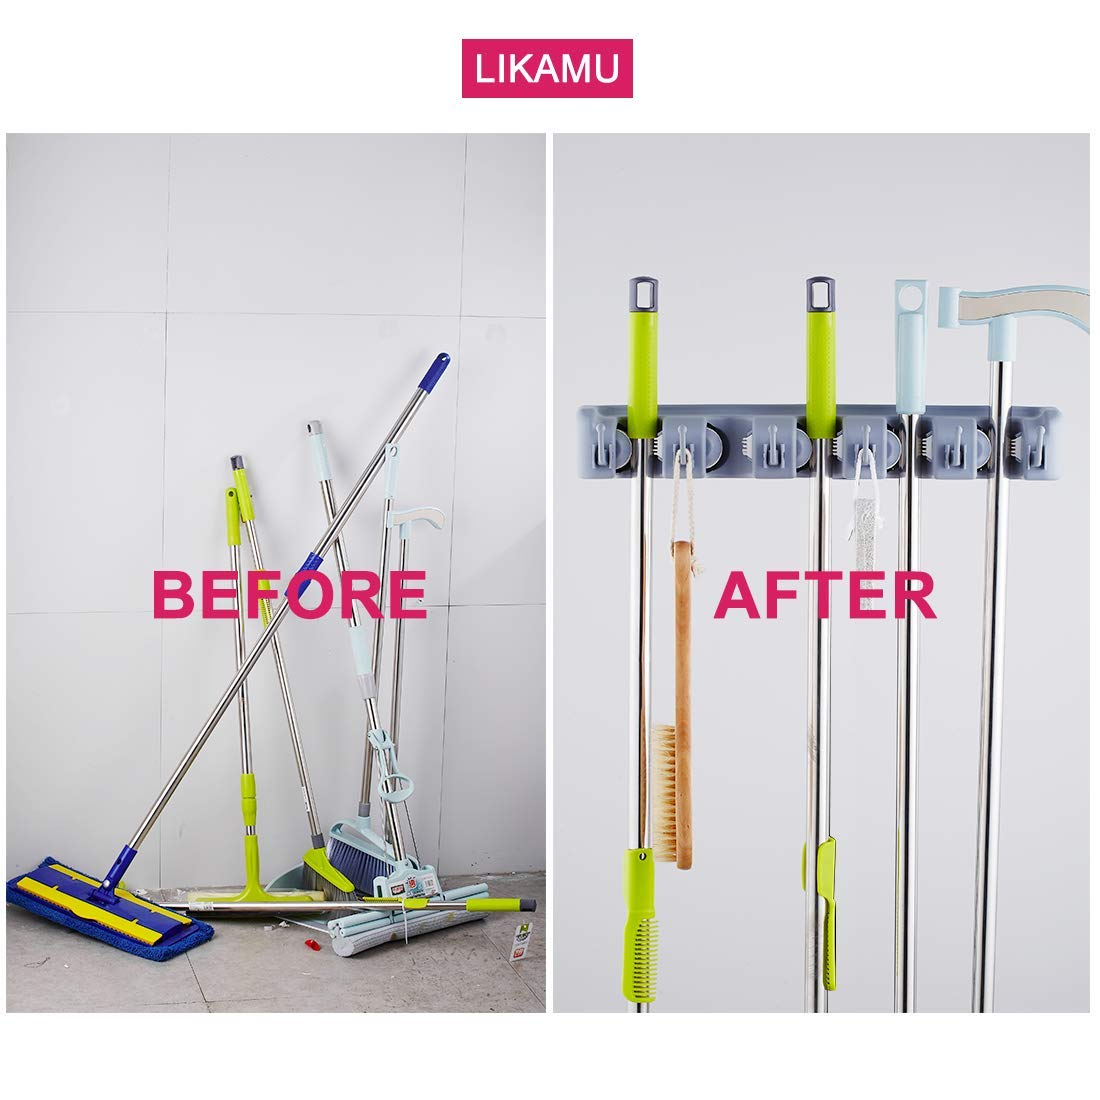 LIKAMU Mop Broom Holder Wall Mount, 5 Position with 6 Hooks, Storage Rack for Garden Kitchen Garage Laundry, Over The Door Wall Broom Organizer